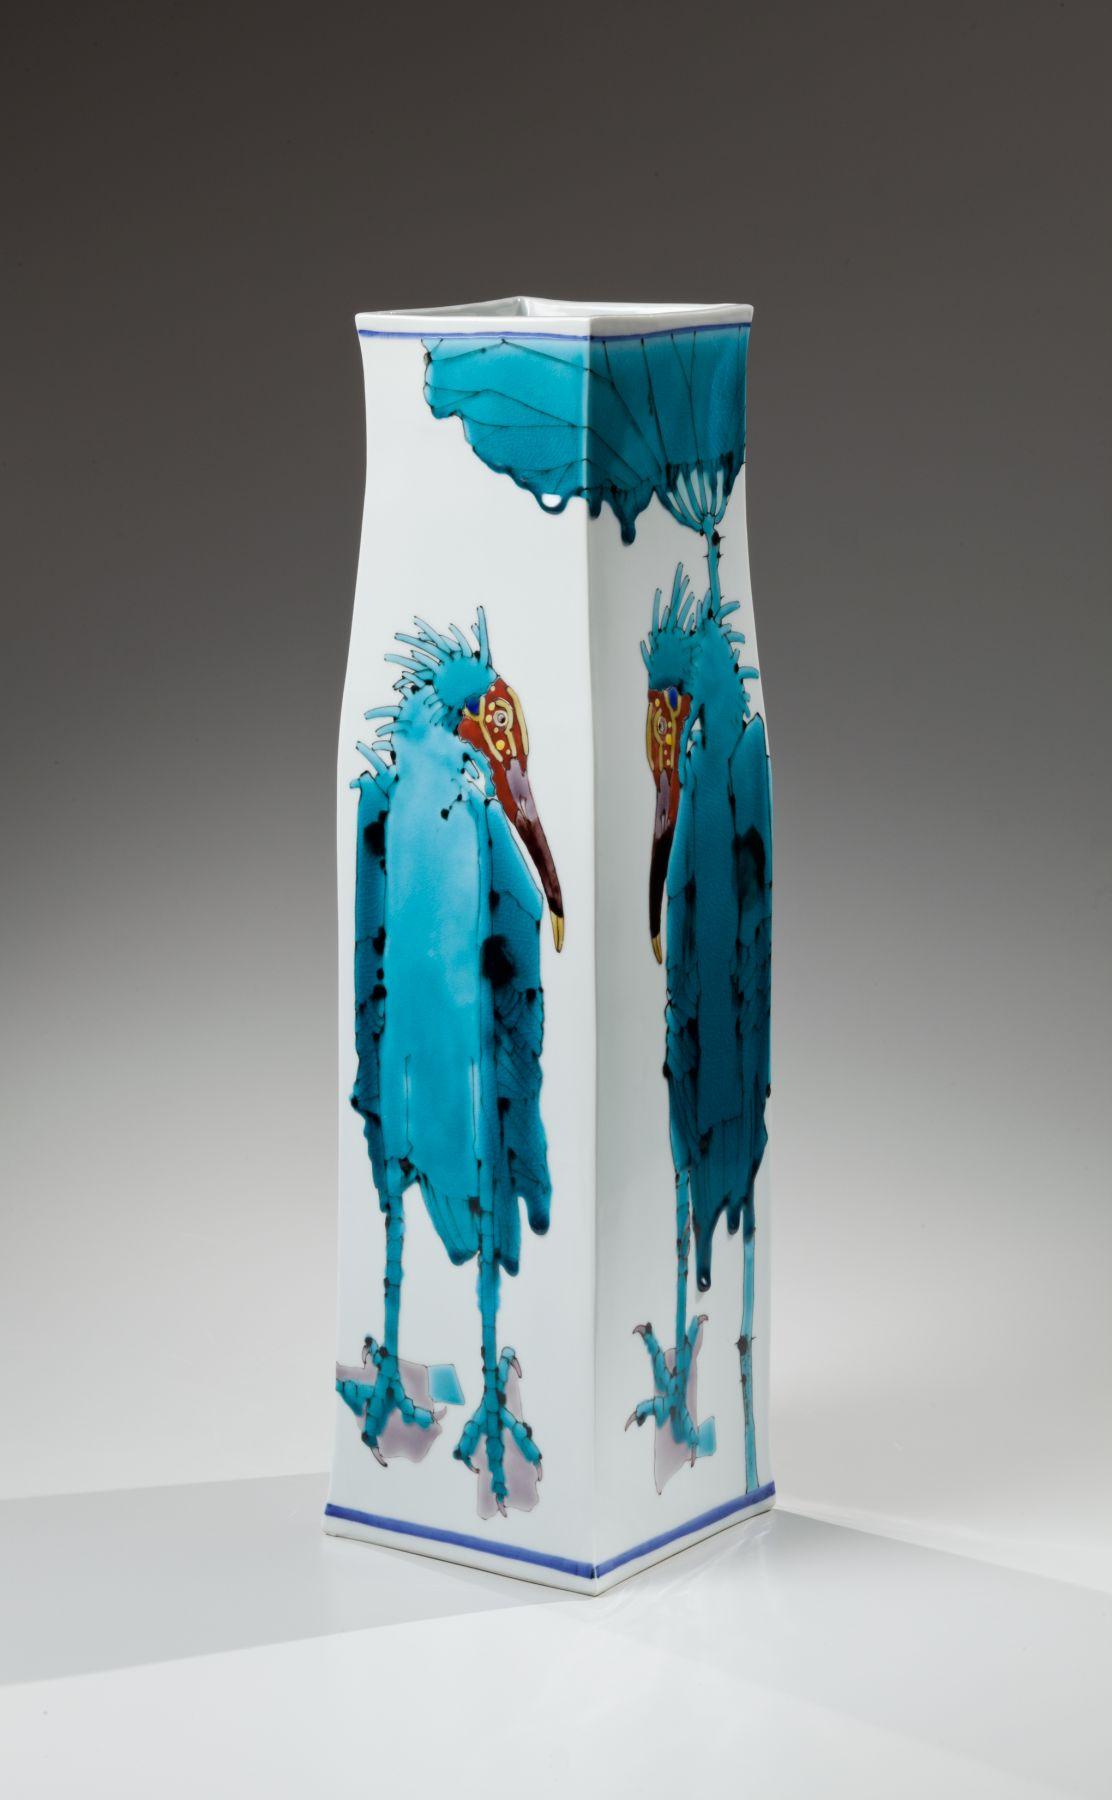 Takegoshi Jun, Japanese glazed porcelain, Japanese kutani-glazed porcelain, Japanese vessel, 2015